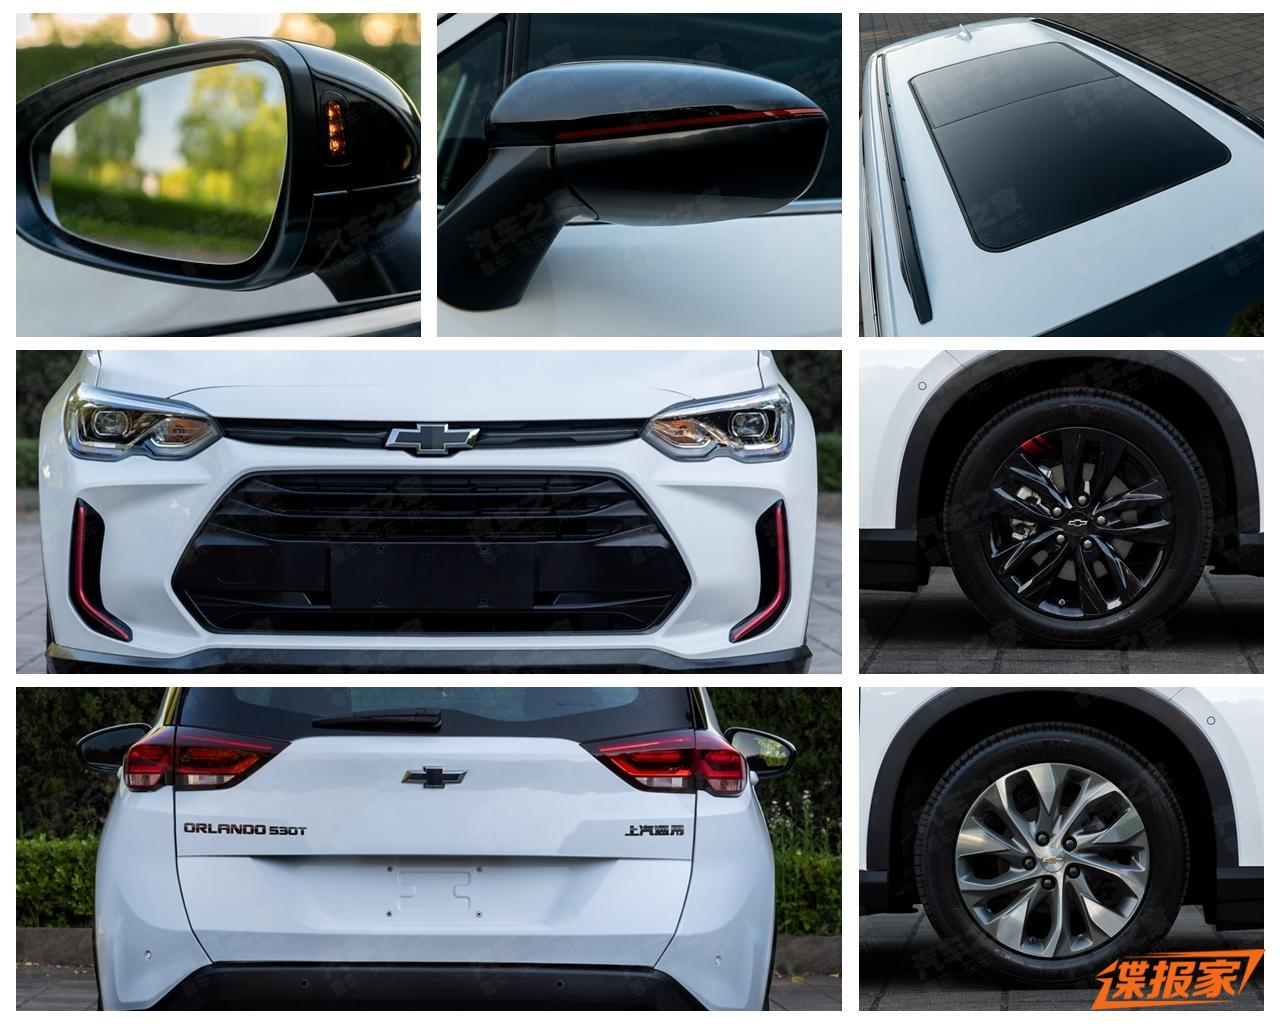 Chevrolet Orlando 2018 (4)